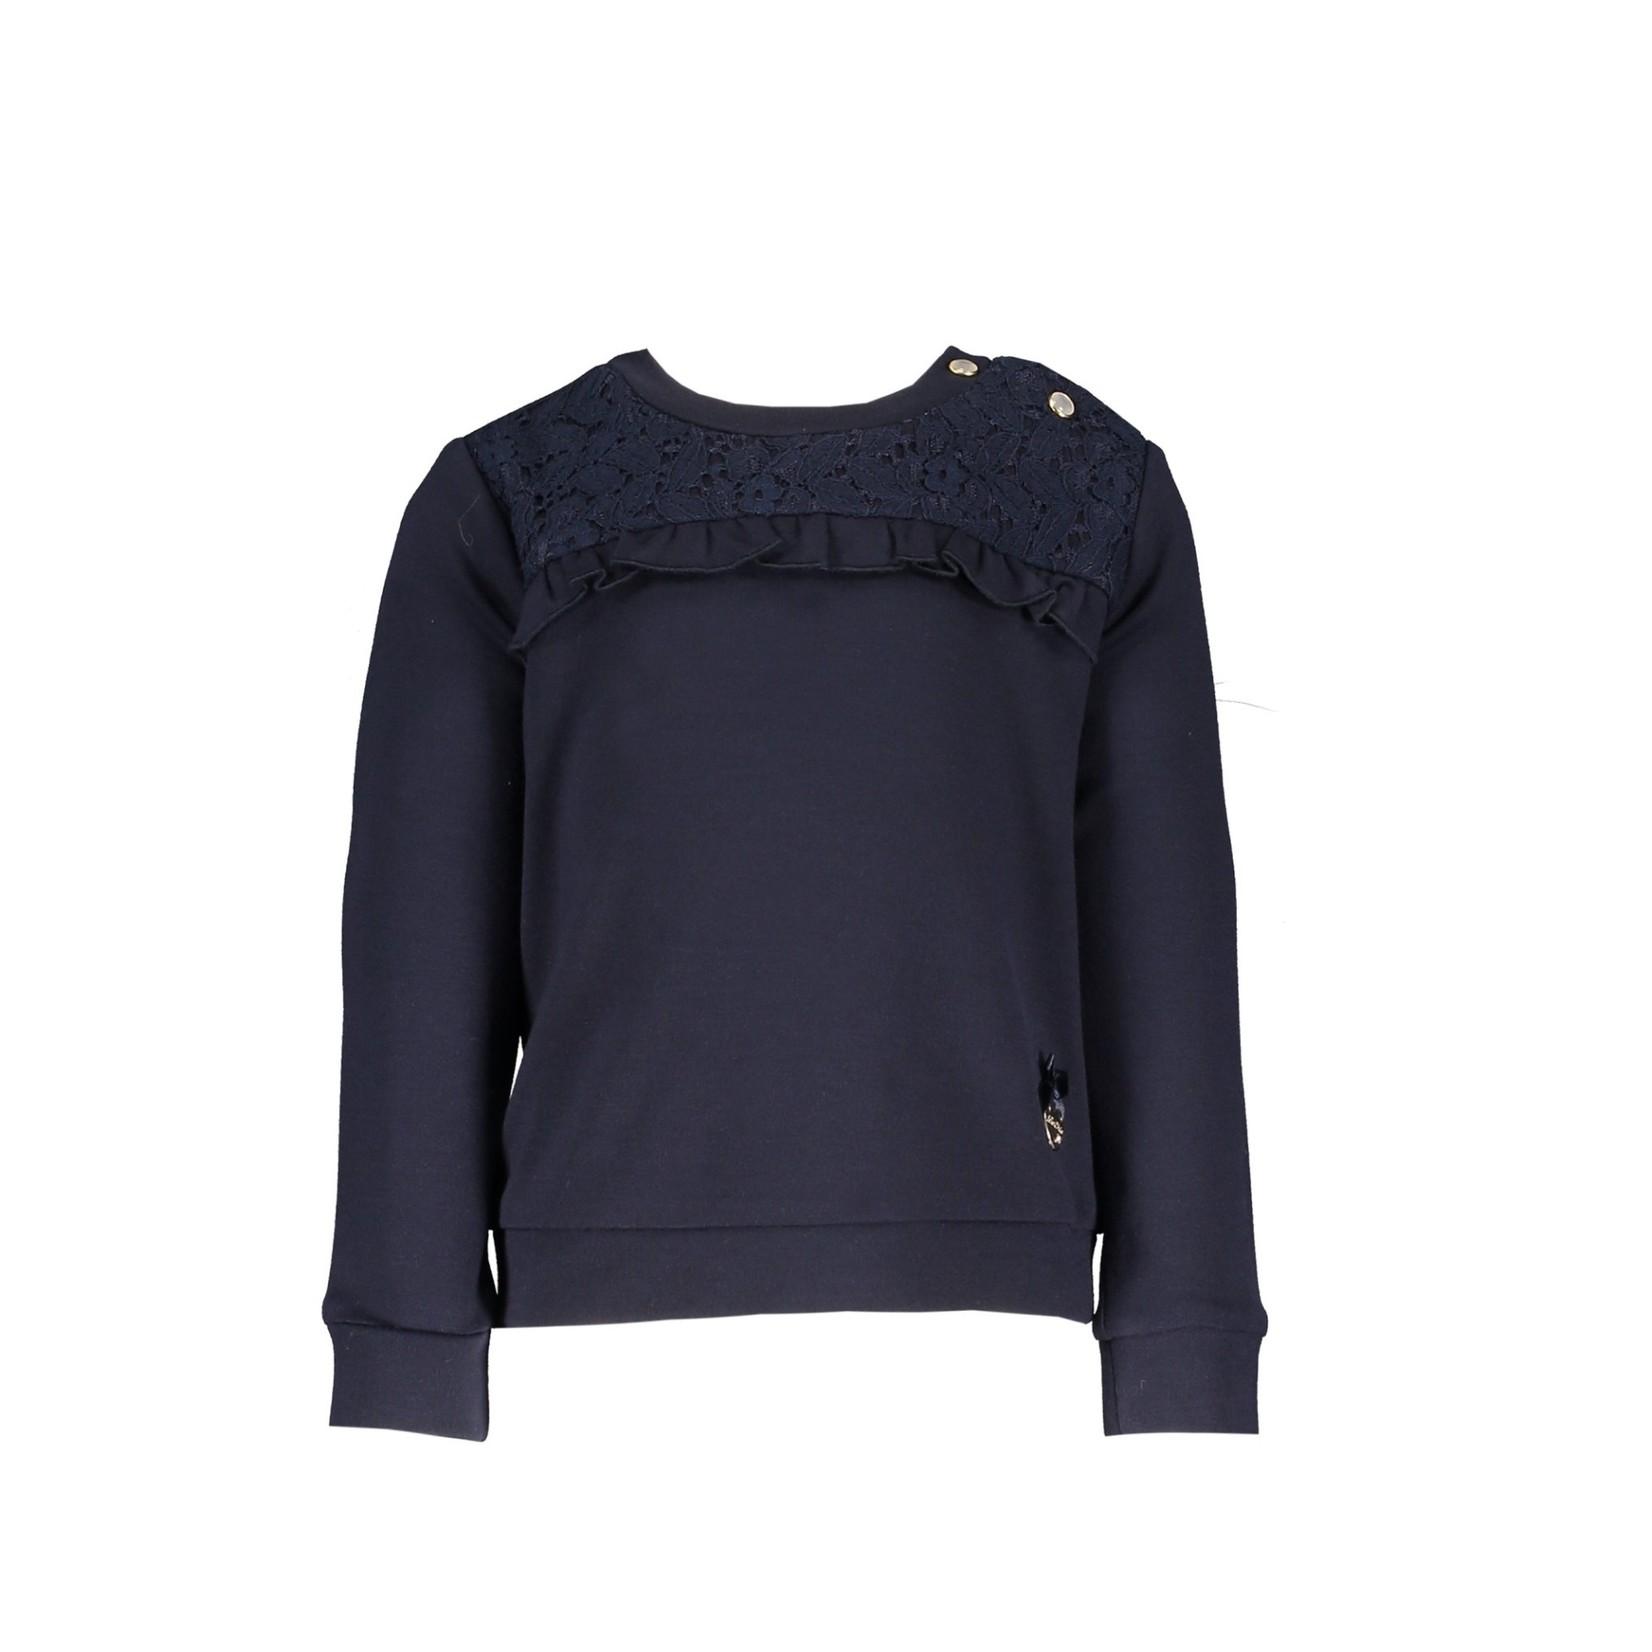 Le Chic sweater ruffle & lace insert